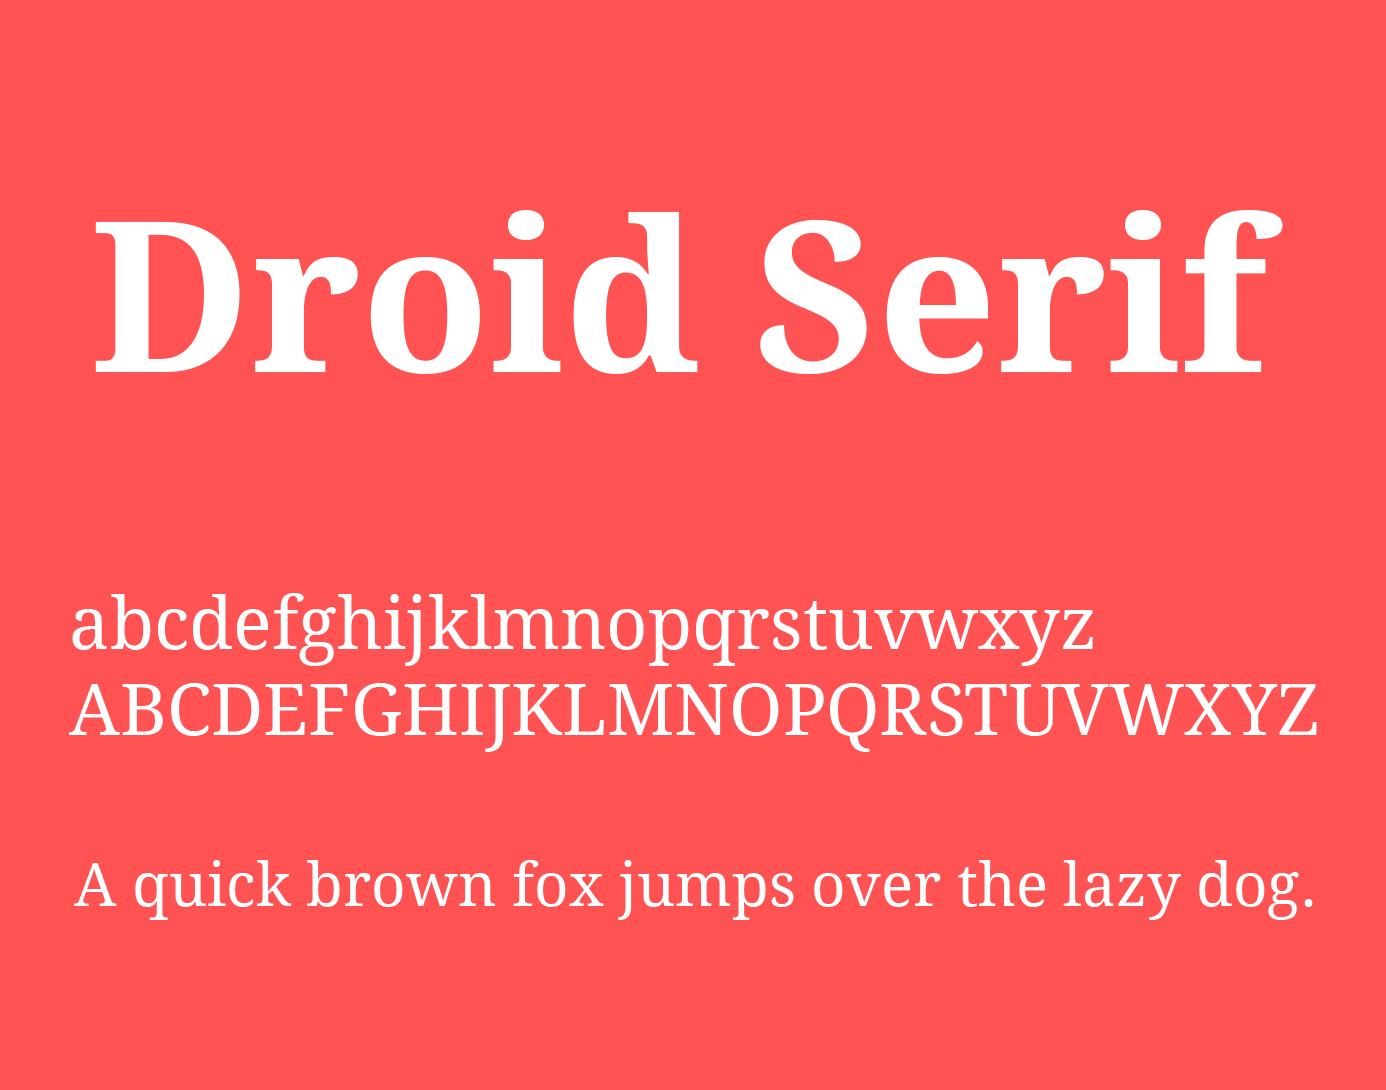 https://fontclarity.com/wp-content/uploads/2019/09/droid-serif-download-0.png Free Download